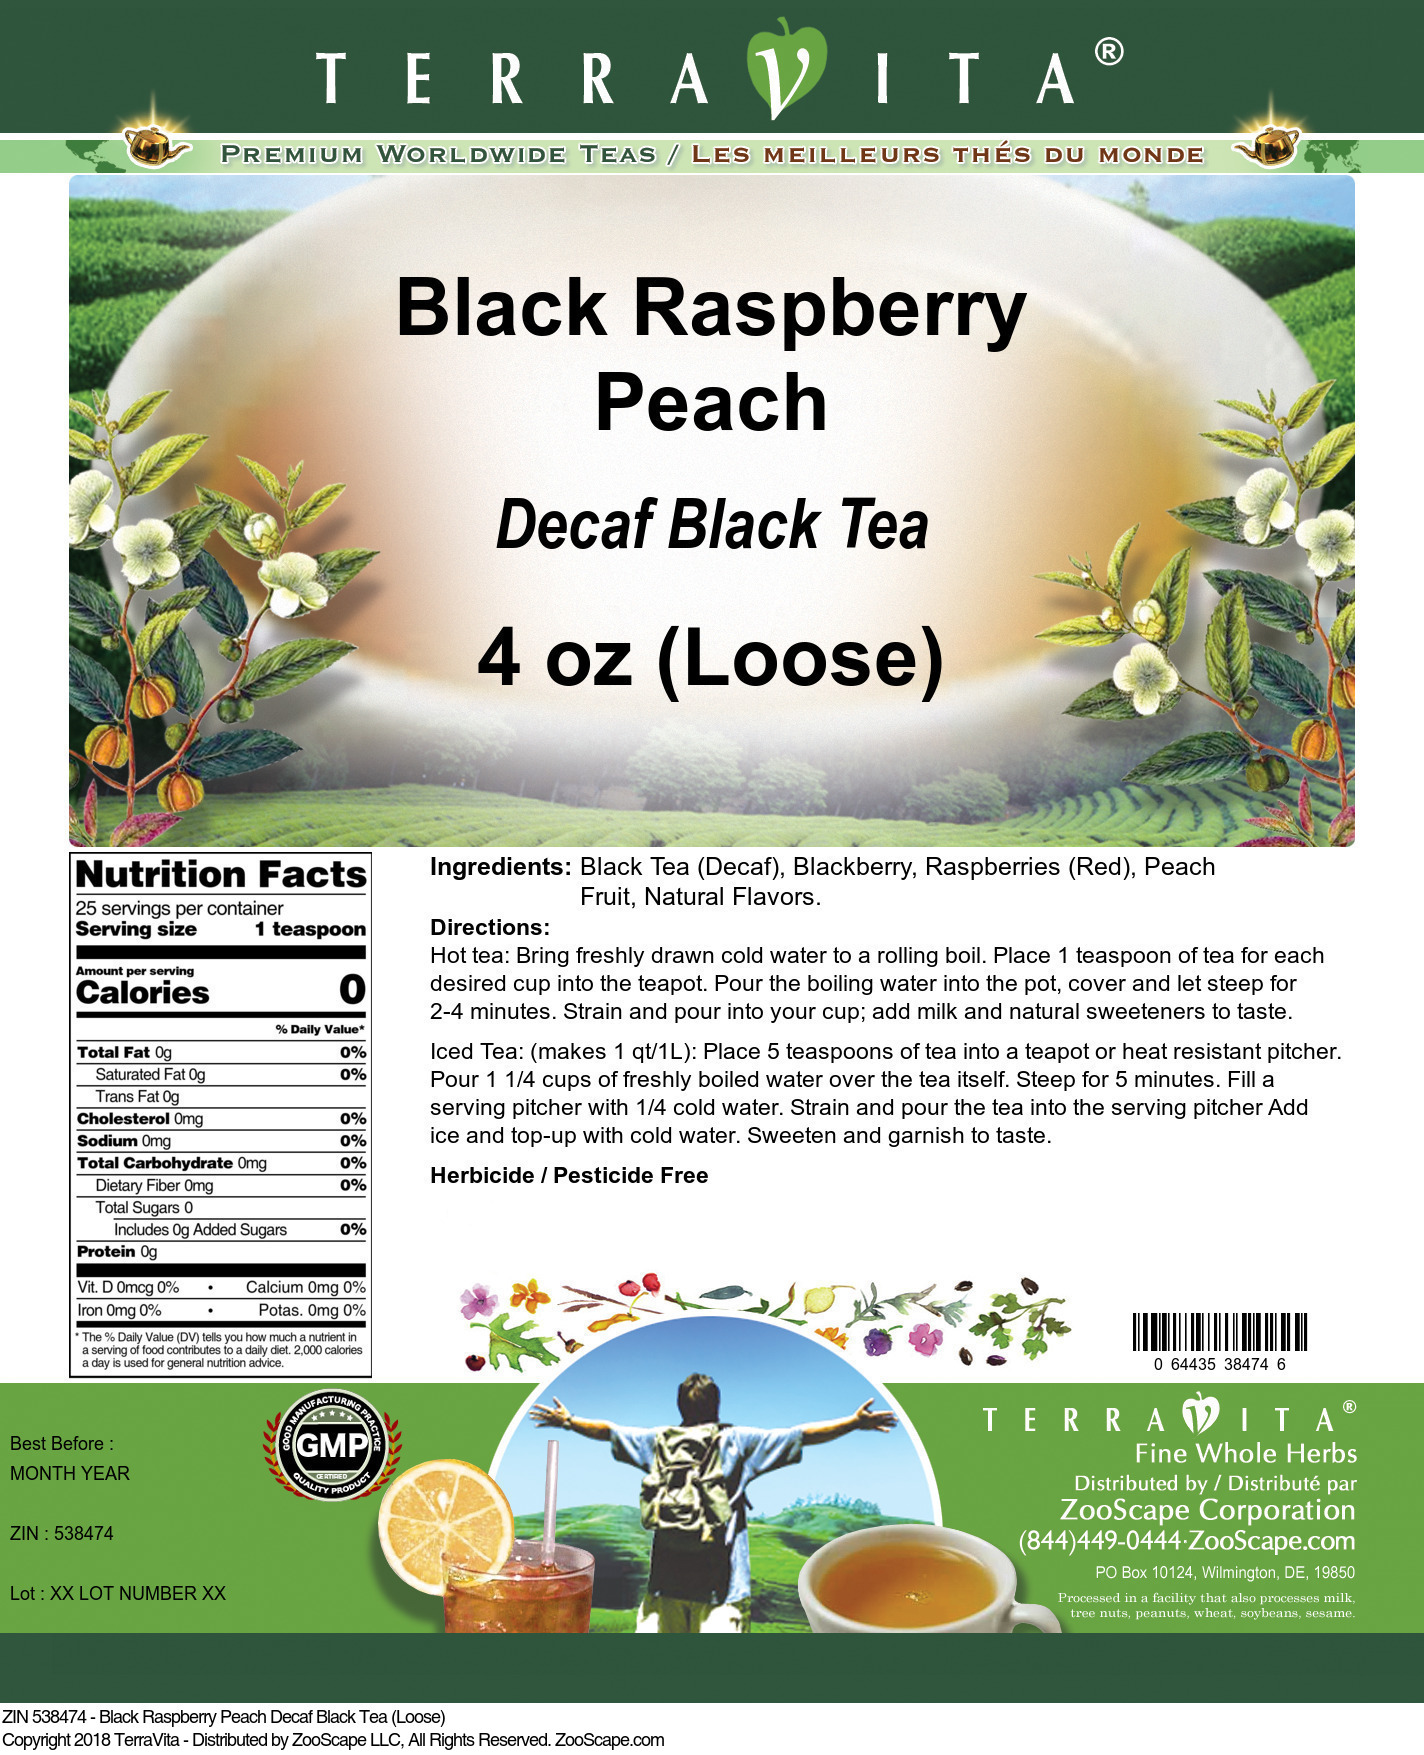 Black Raspberry Peach Decaf Black Tea (Loose)